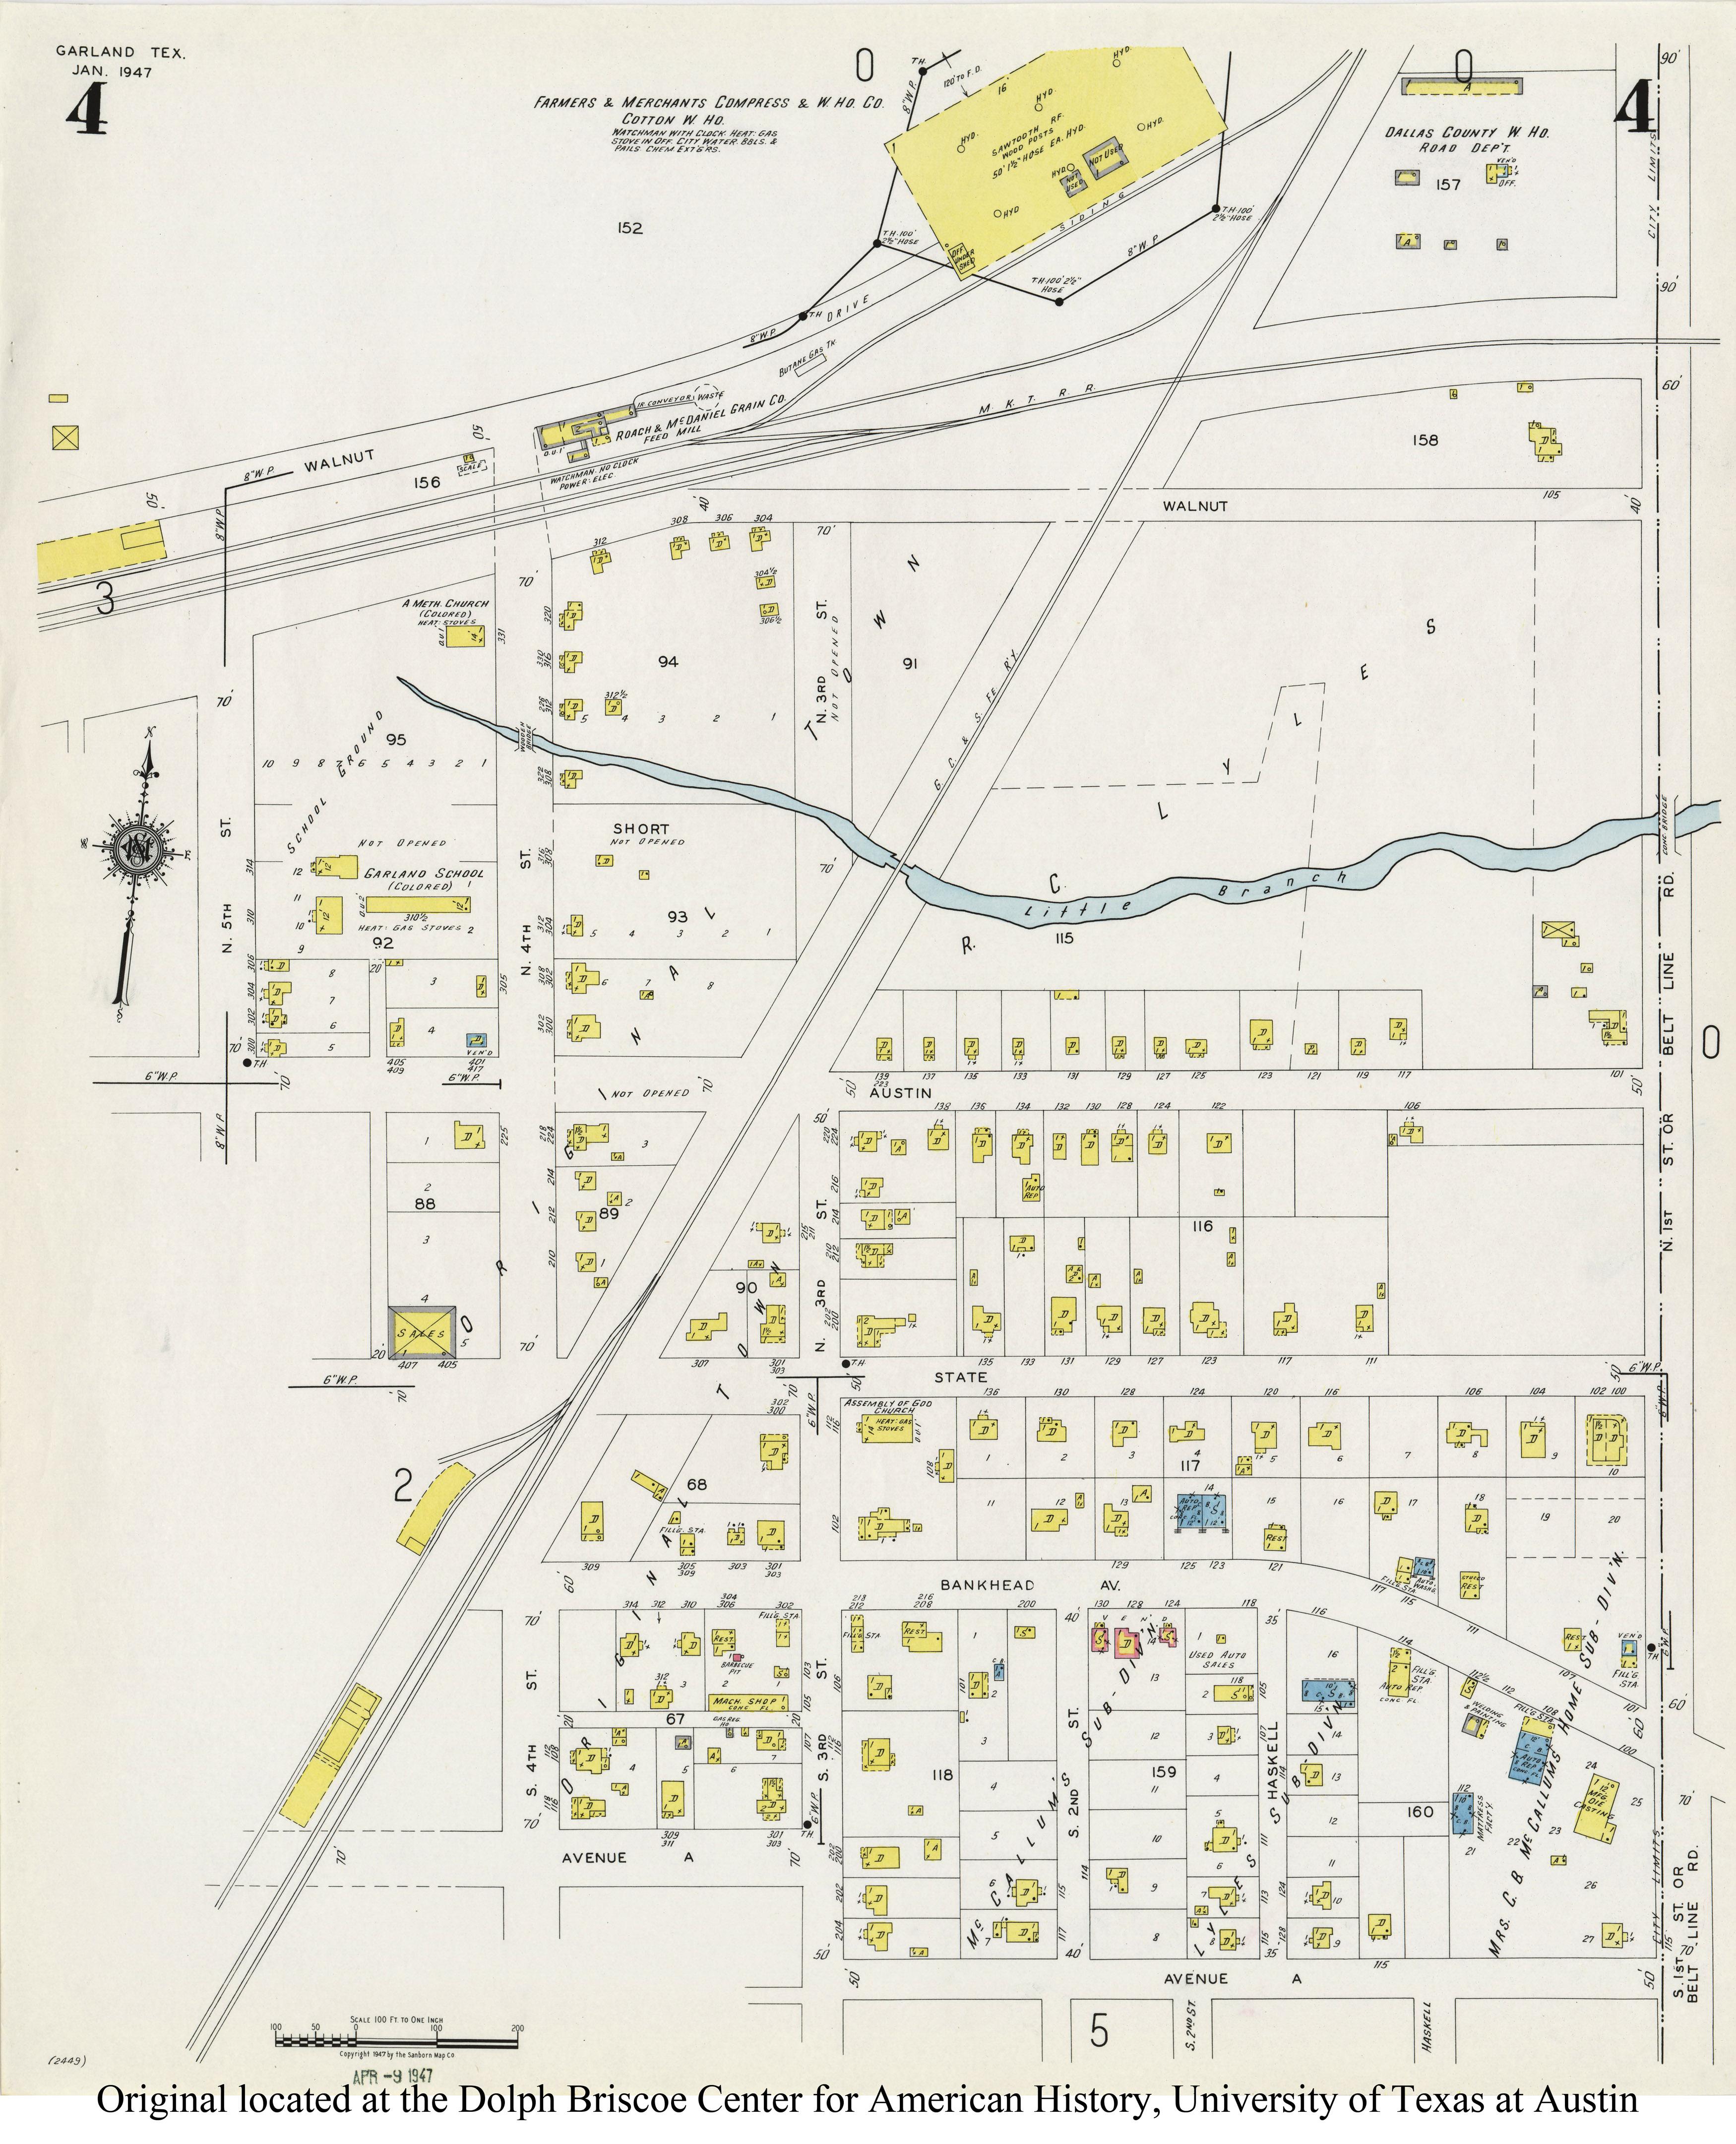 Garland Landmark Society - Sanborn-Perris Map Of Garland, Texas - Garland Texas Map